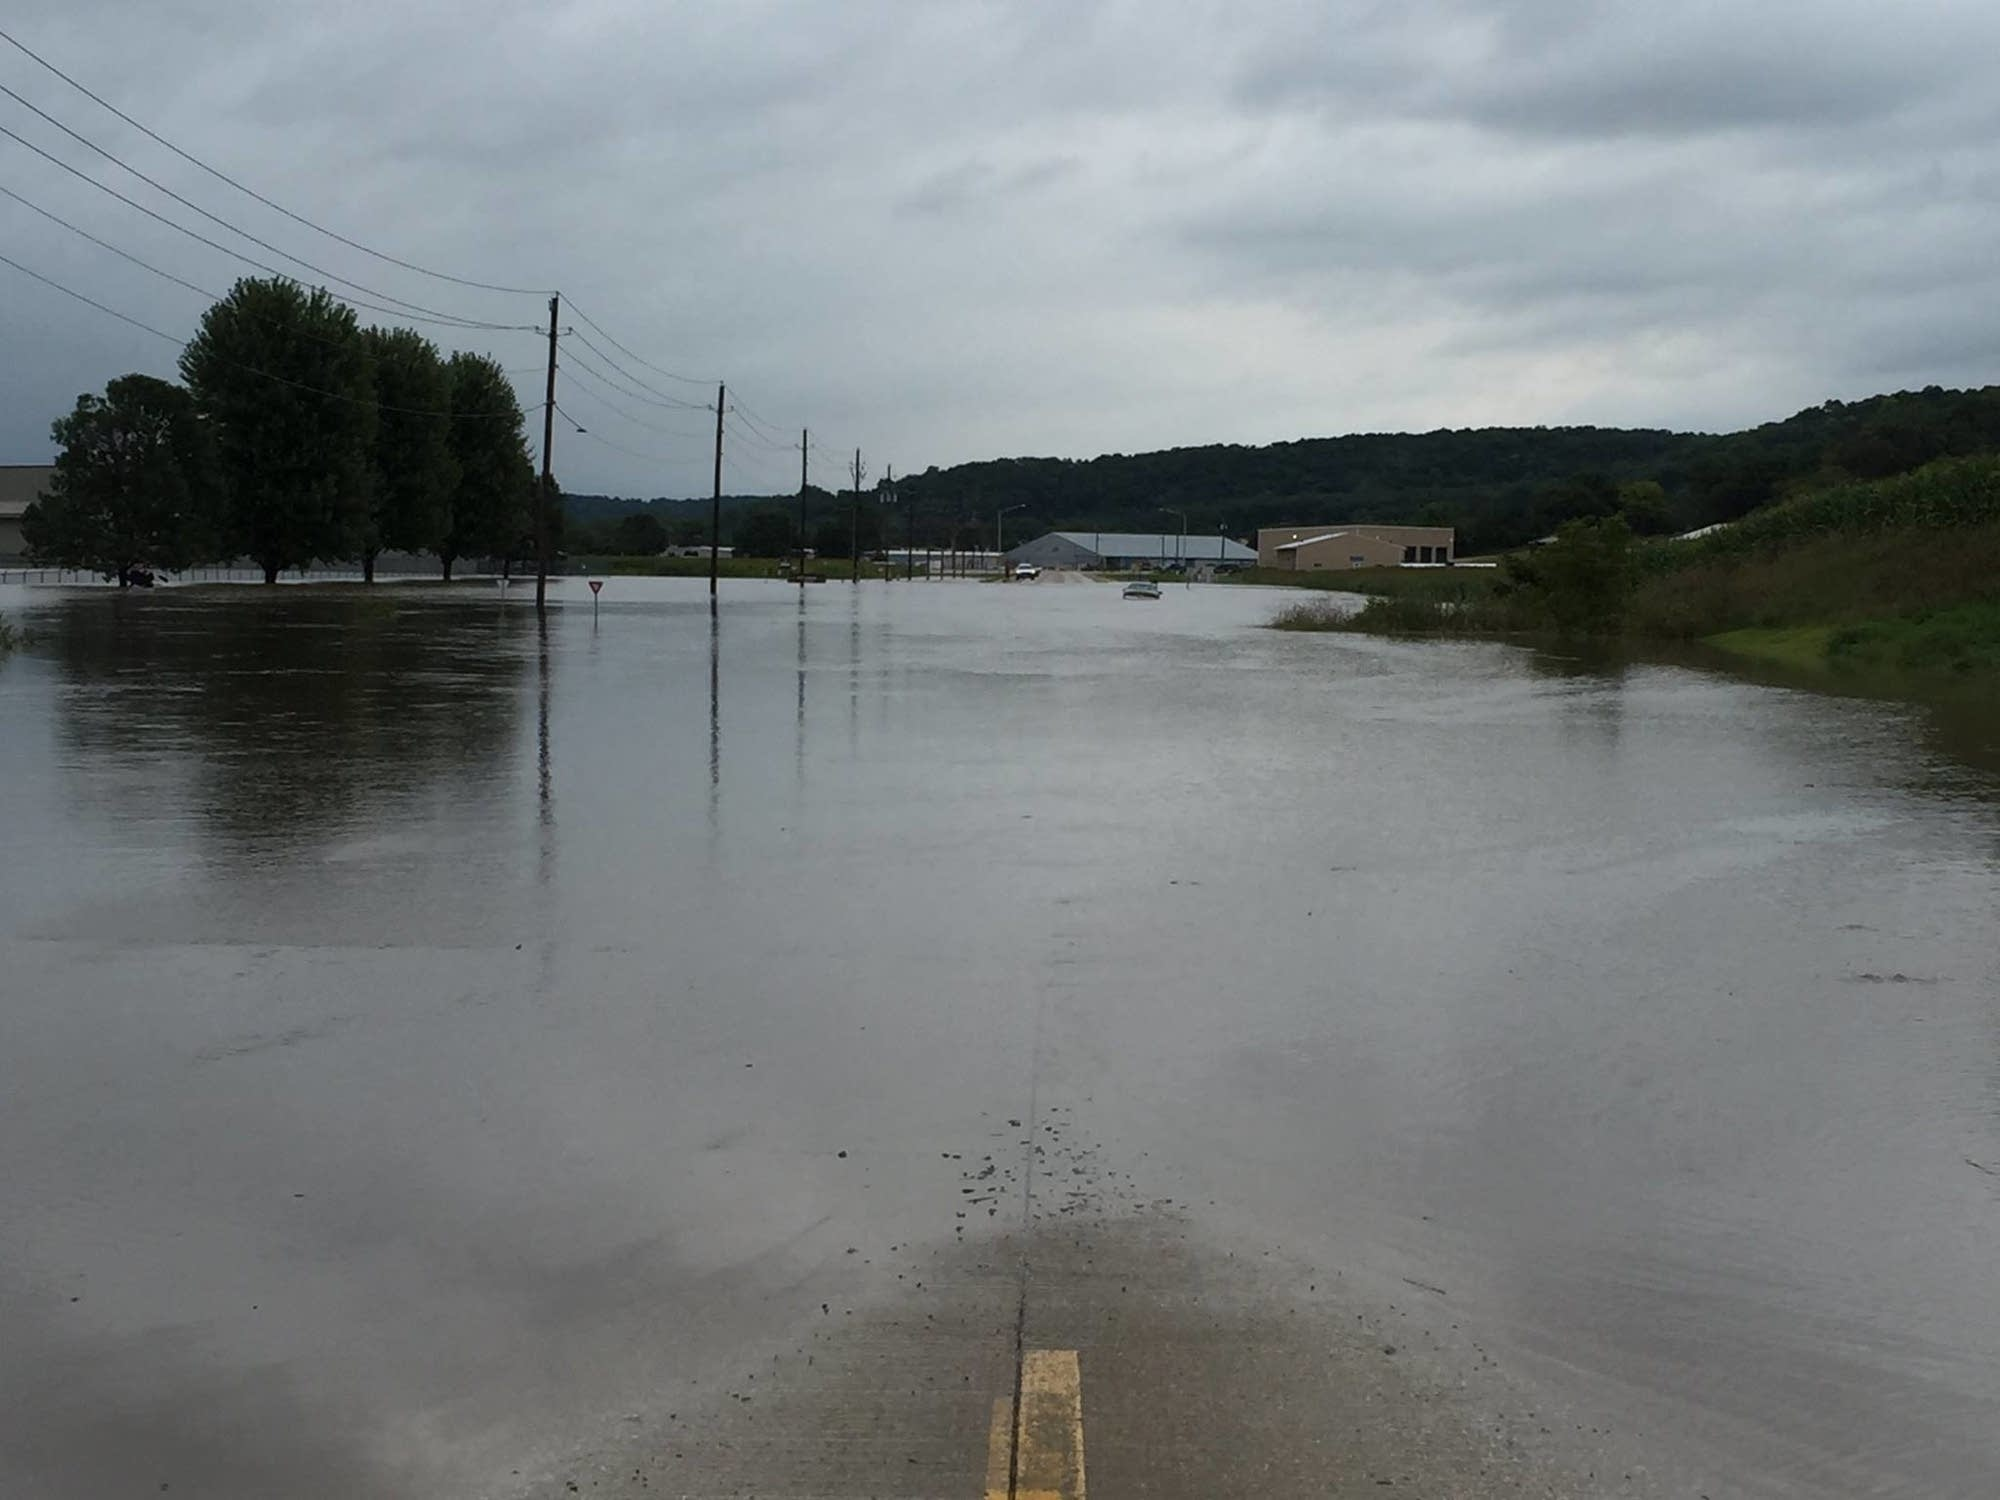 Iowa city flooding pictures